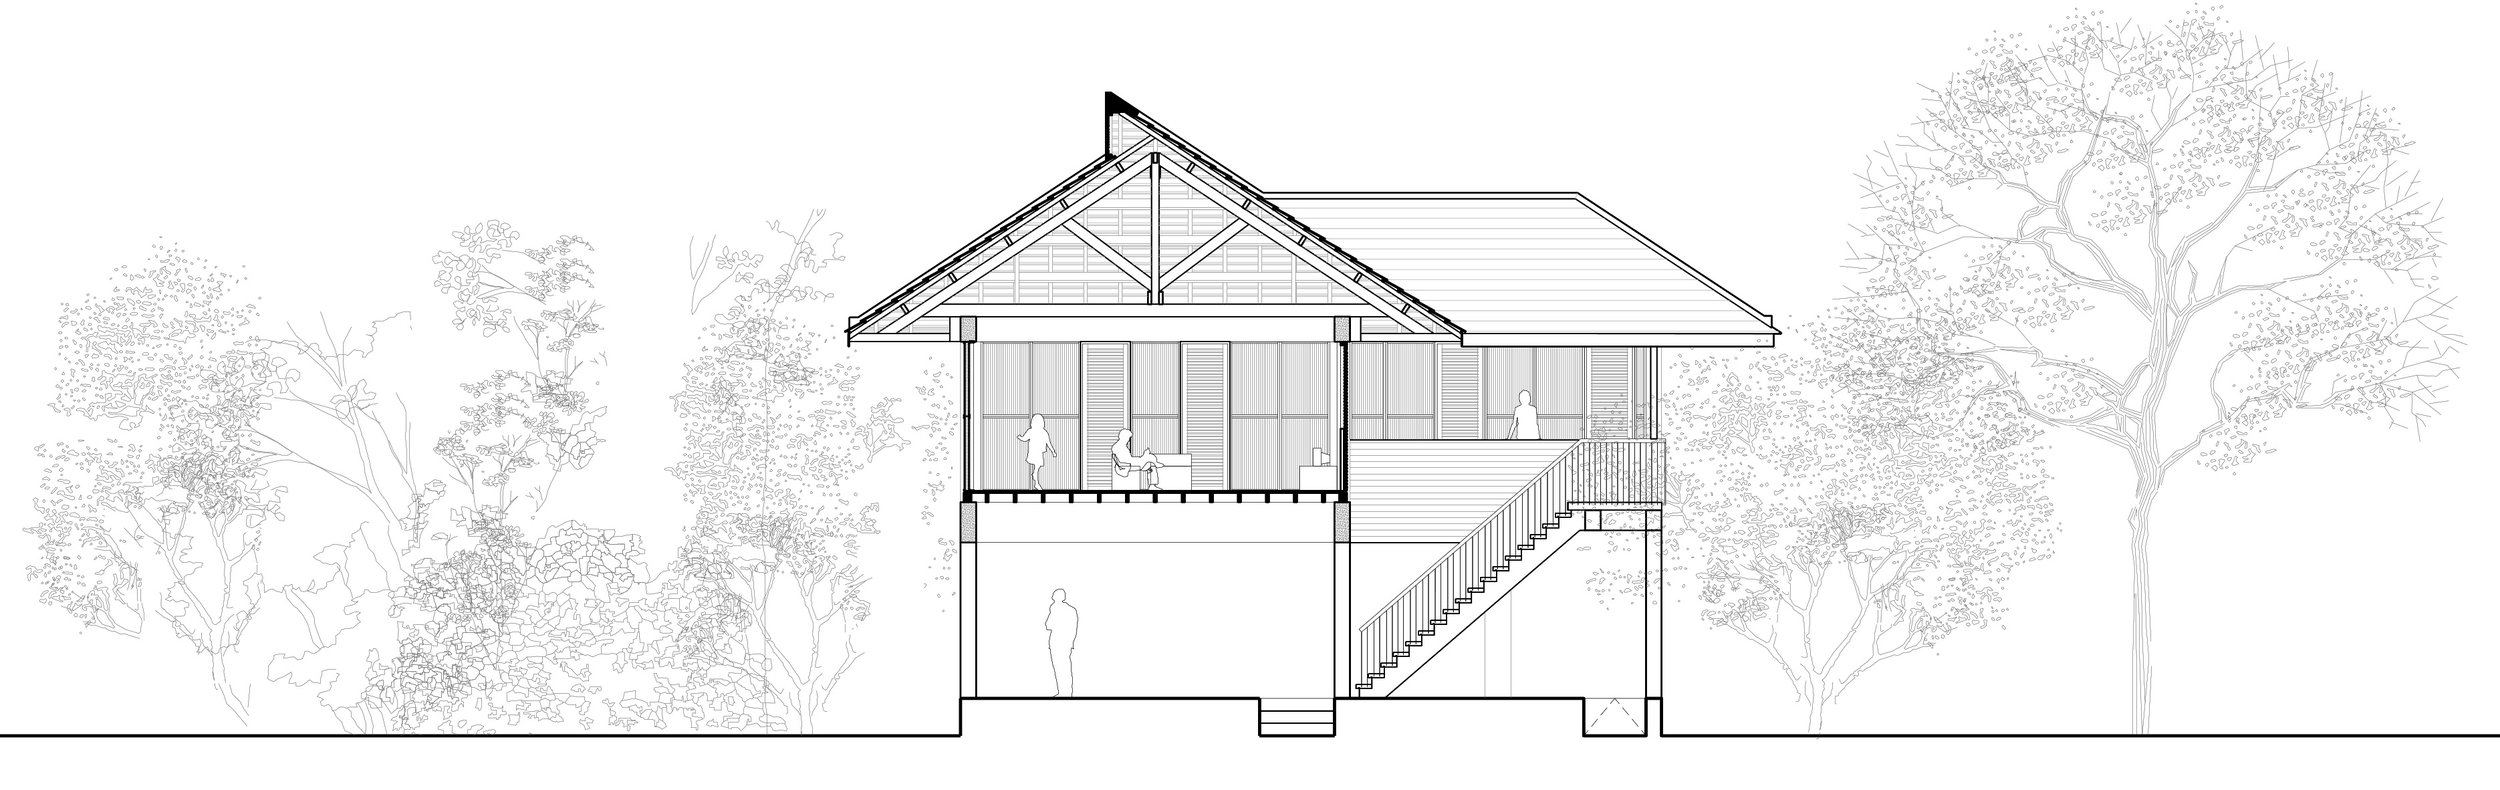 101st House @The Vann Molyvann Project &Project Little Dream